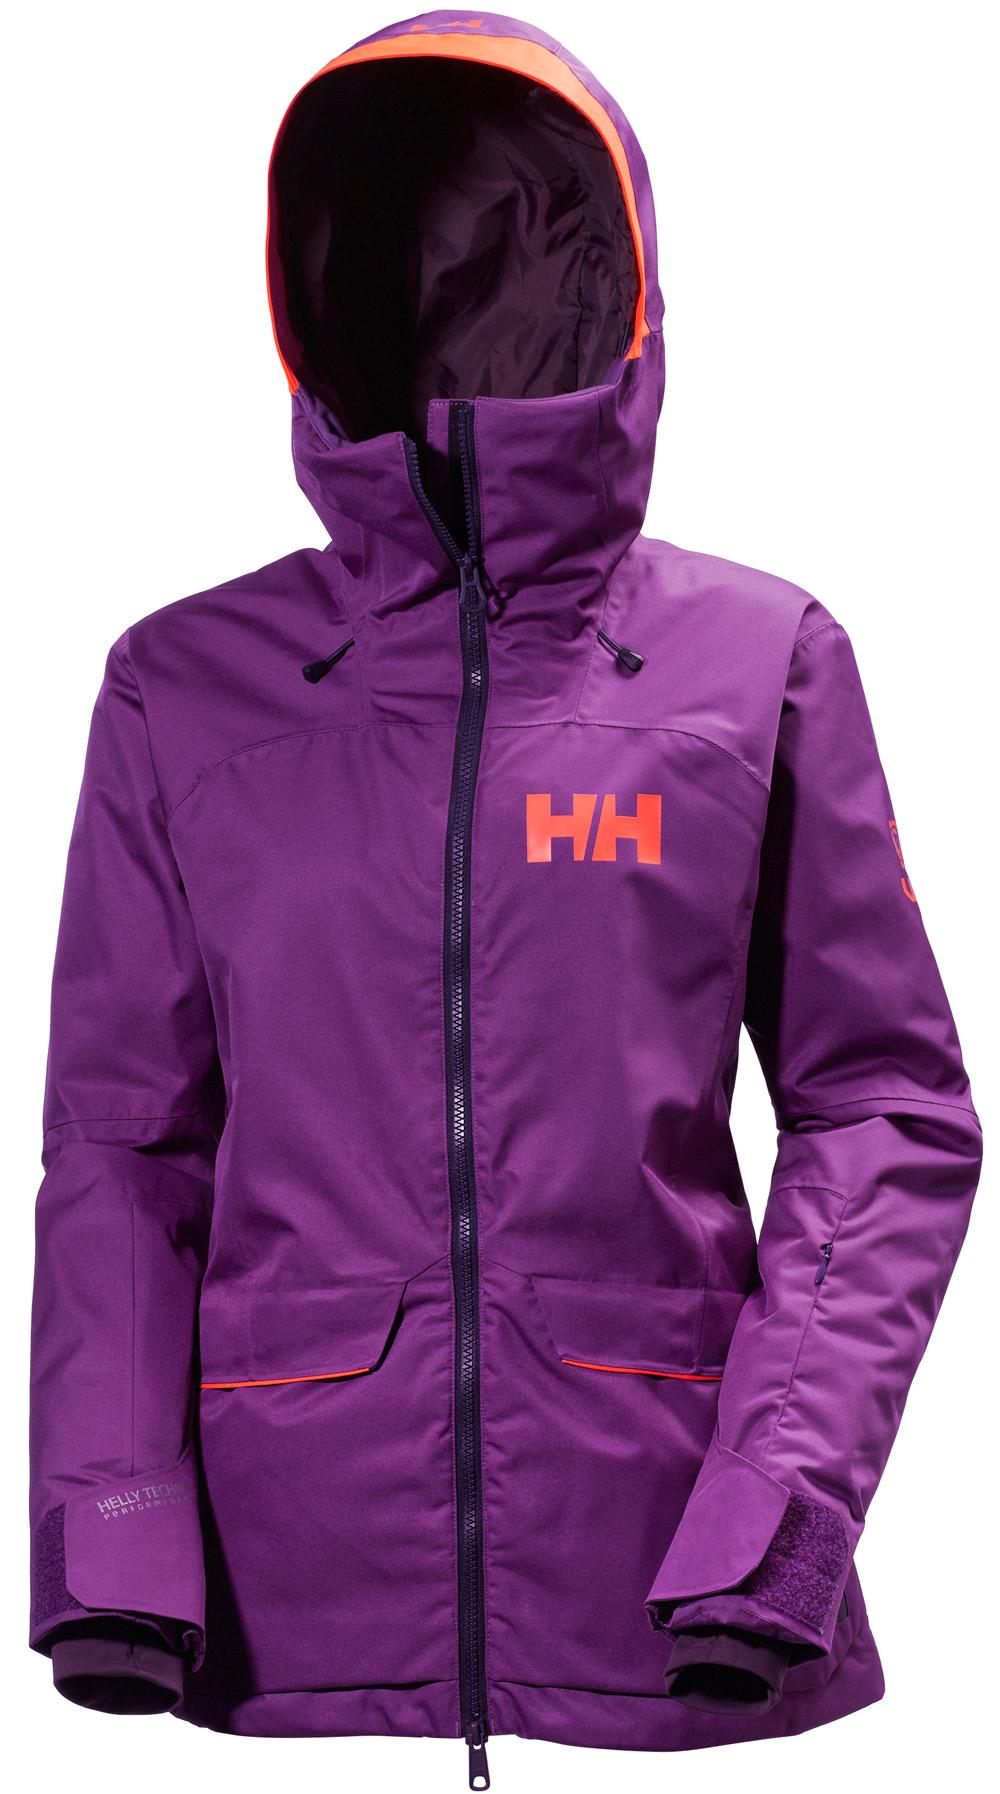 hh-w-powderqueen-jacket-65518_107